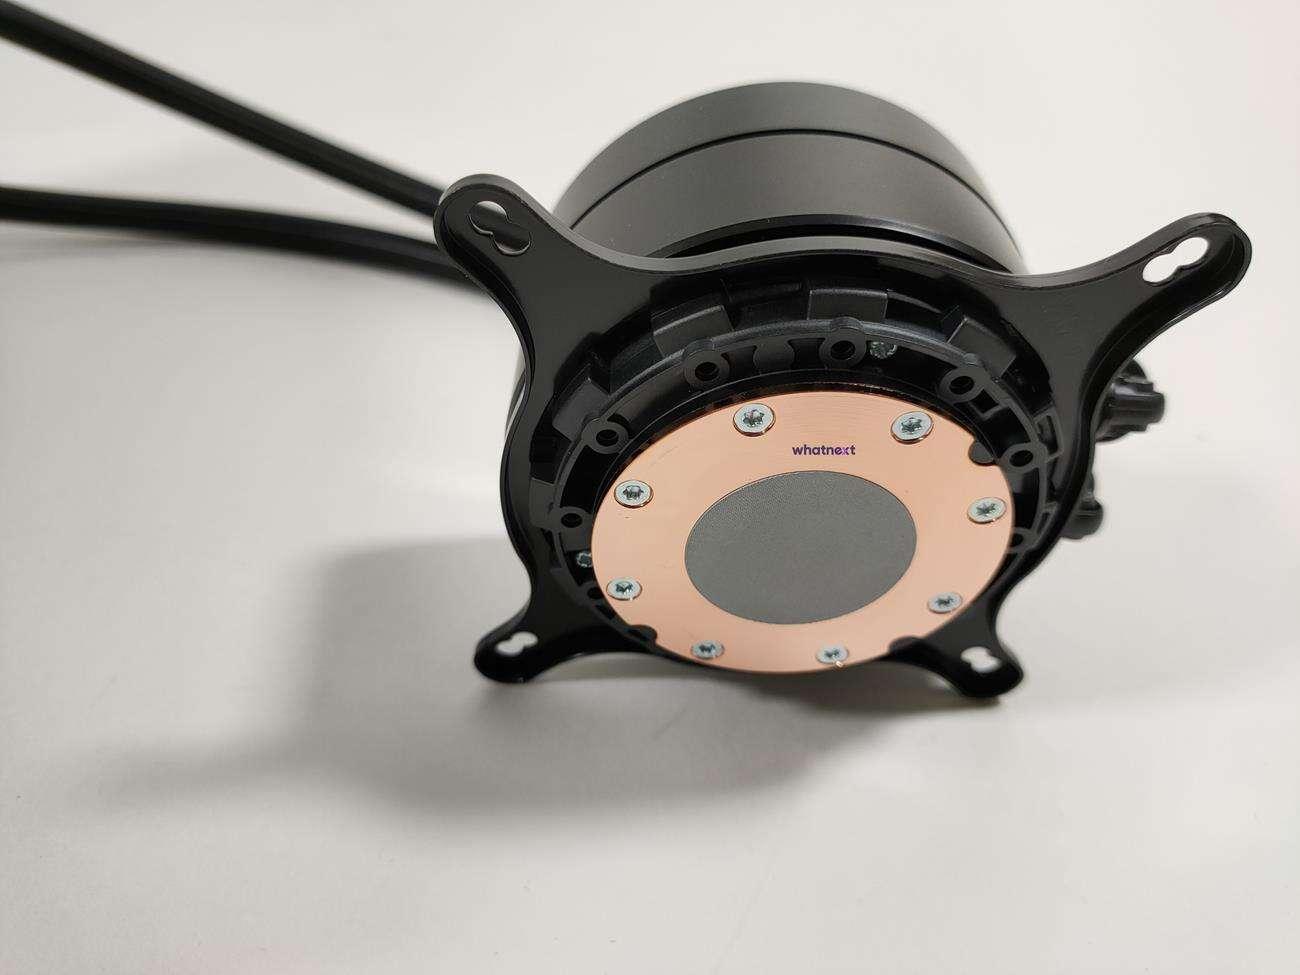 test NZXT Kraken X53 RGB, recenzja NZXT Kraken X53 RGB, review NZXT Kraken X53 RGB, opinia NZXT Kraken X53 RGB